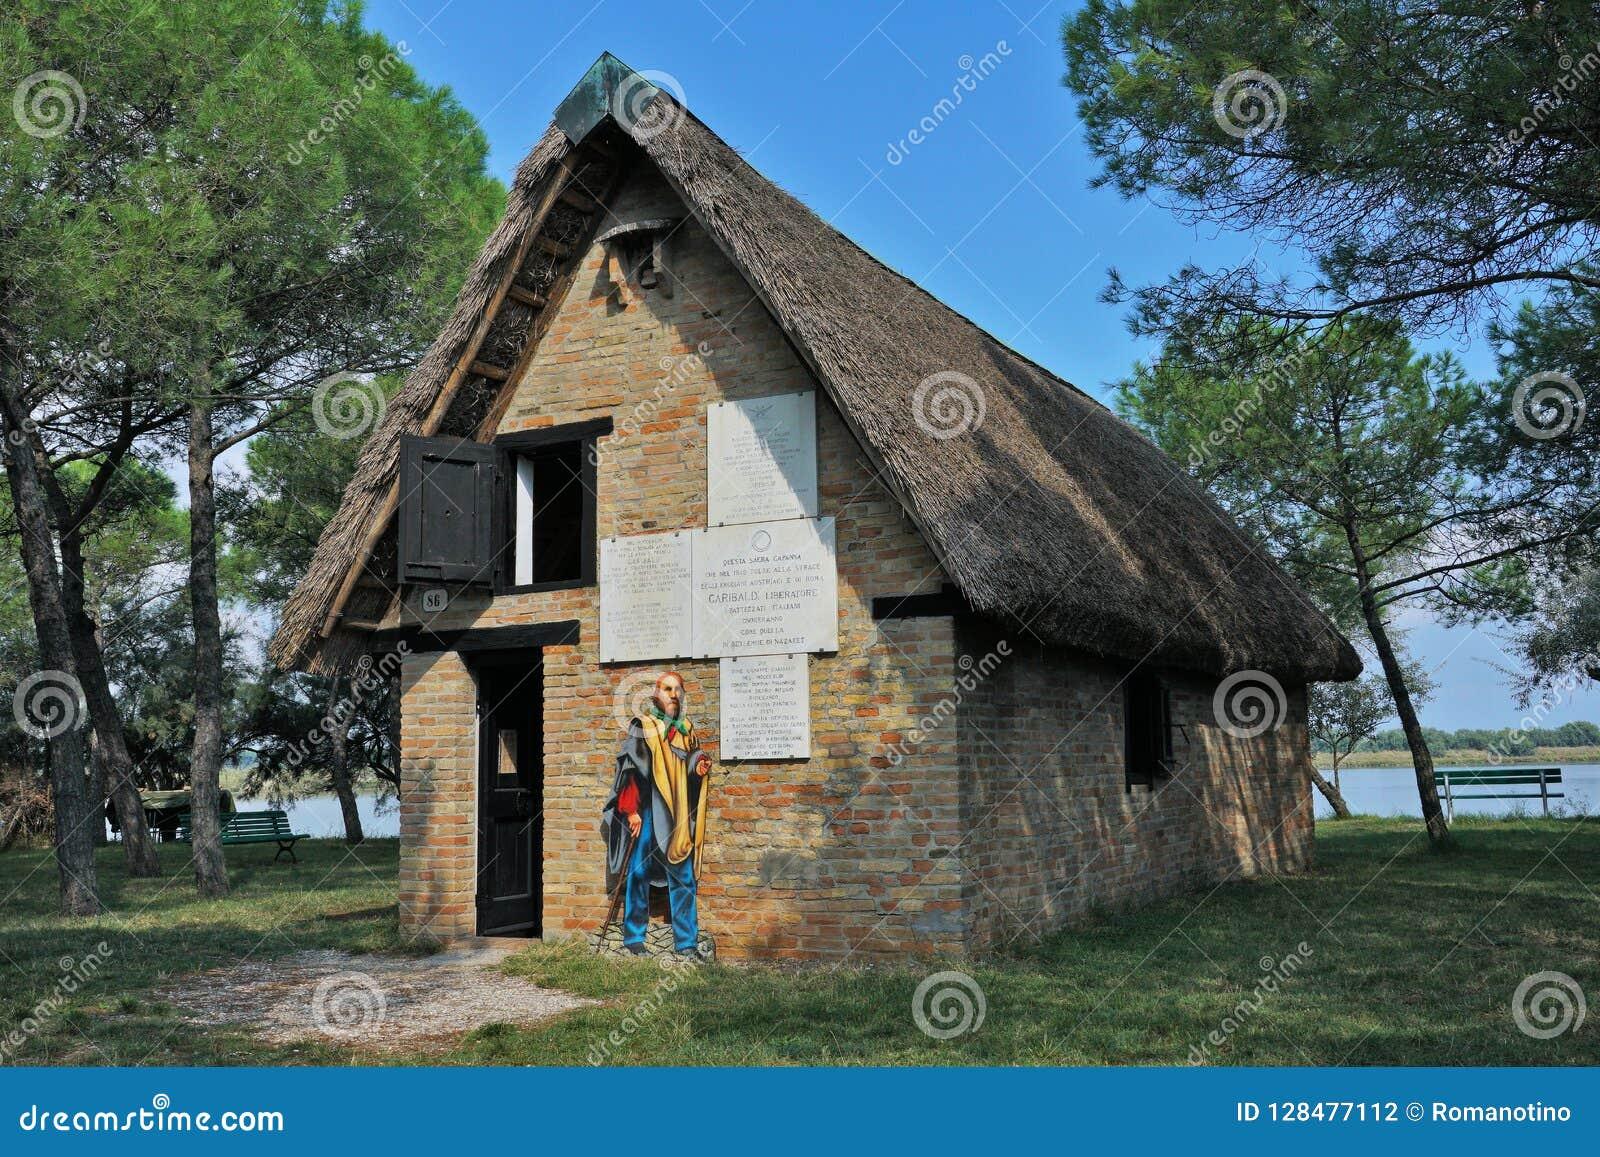 Une vue externe de la hutte de Garibaldi